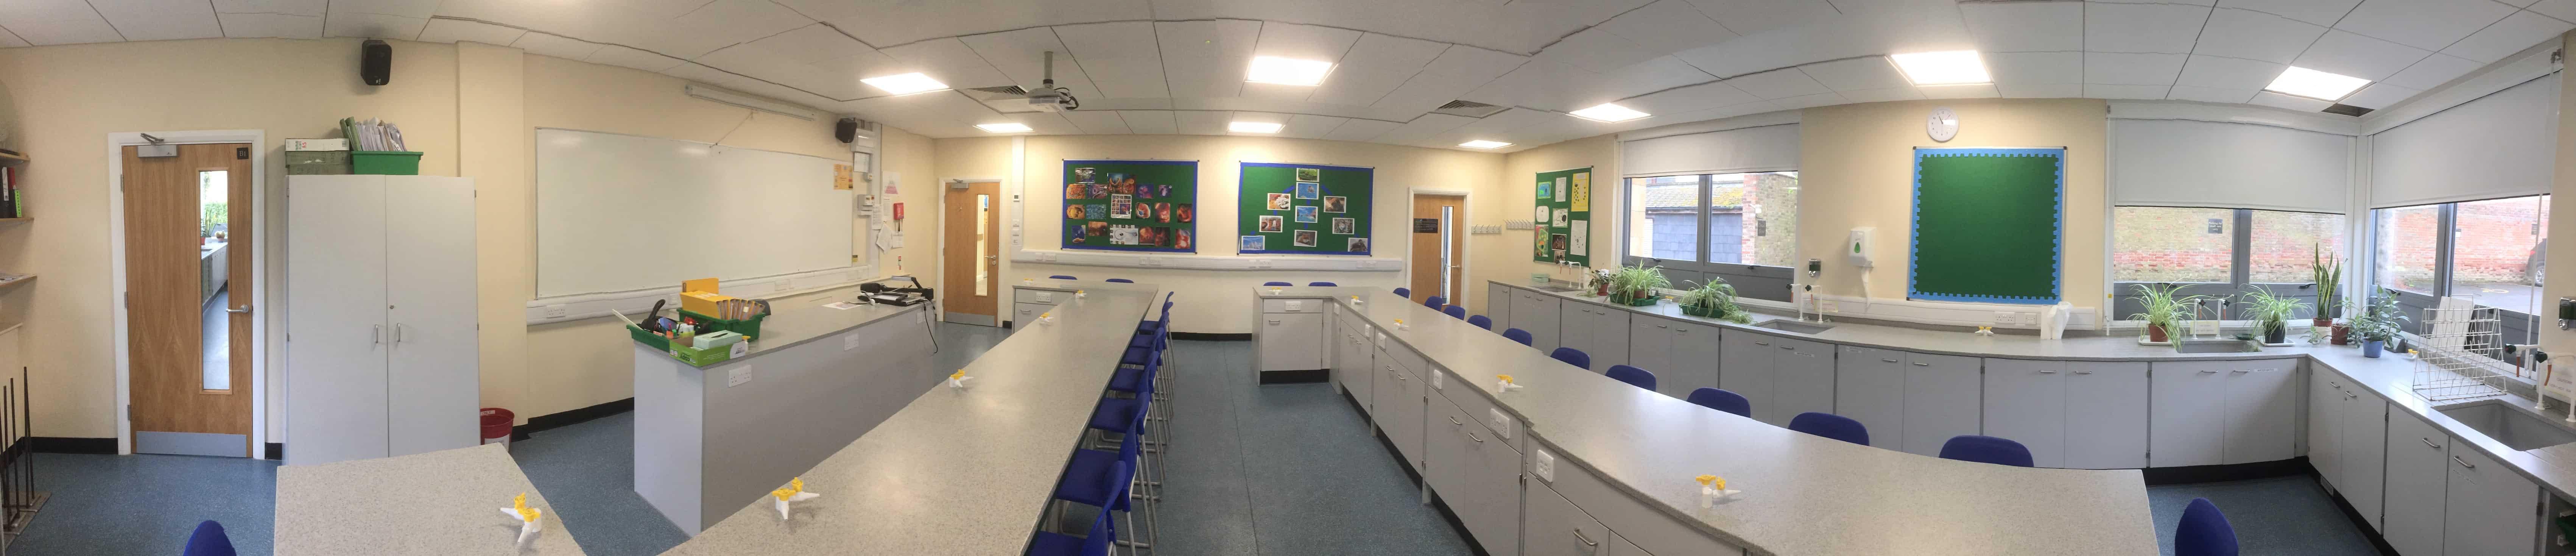 Cheltenham College science lab pano.